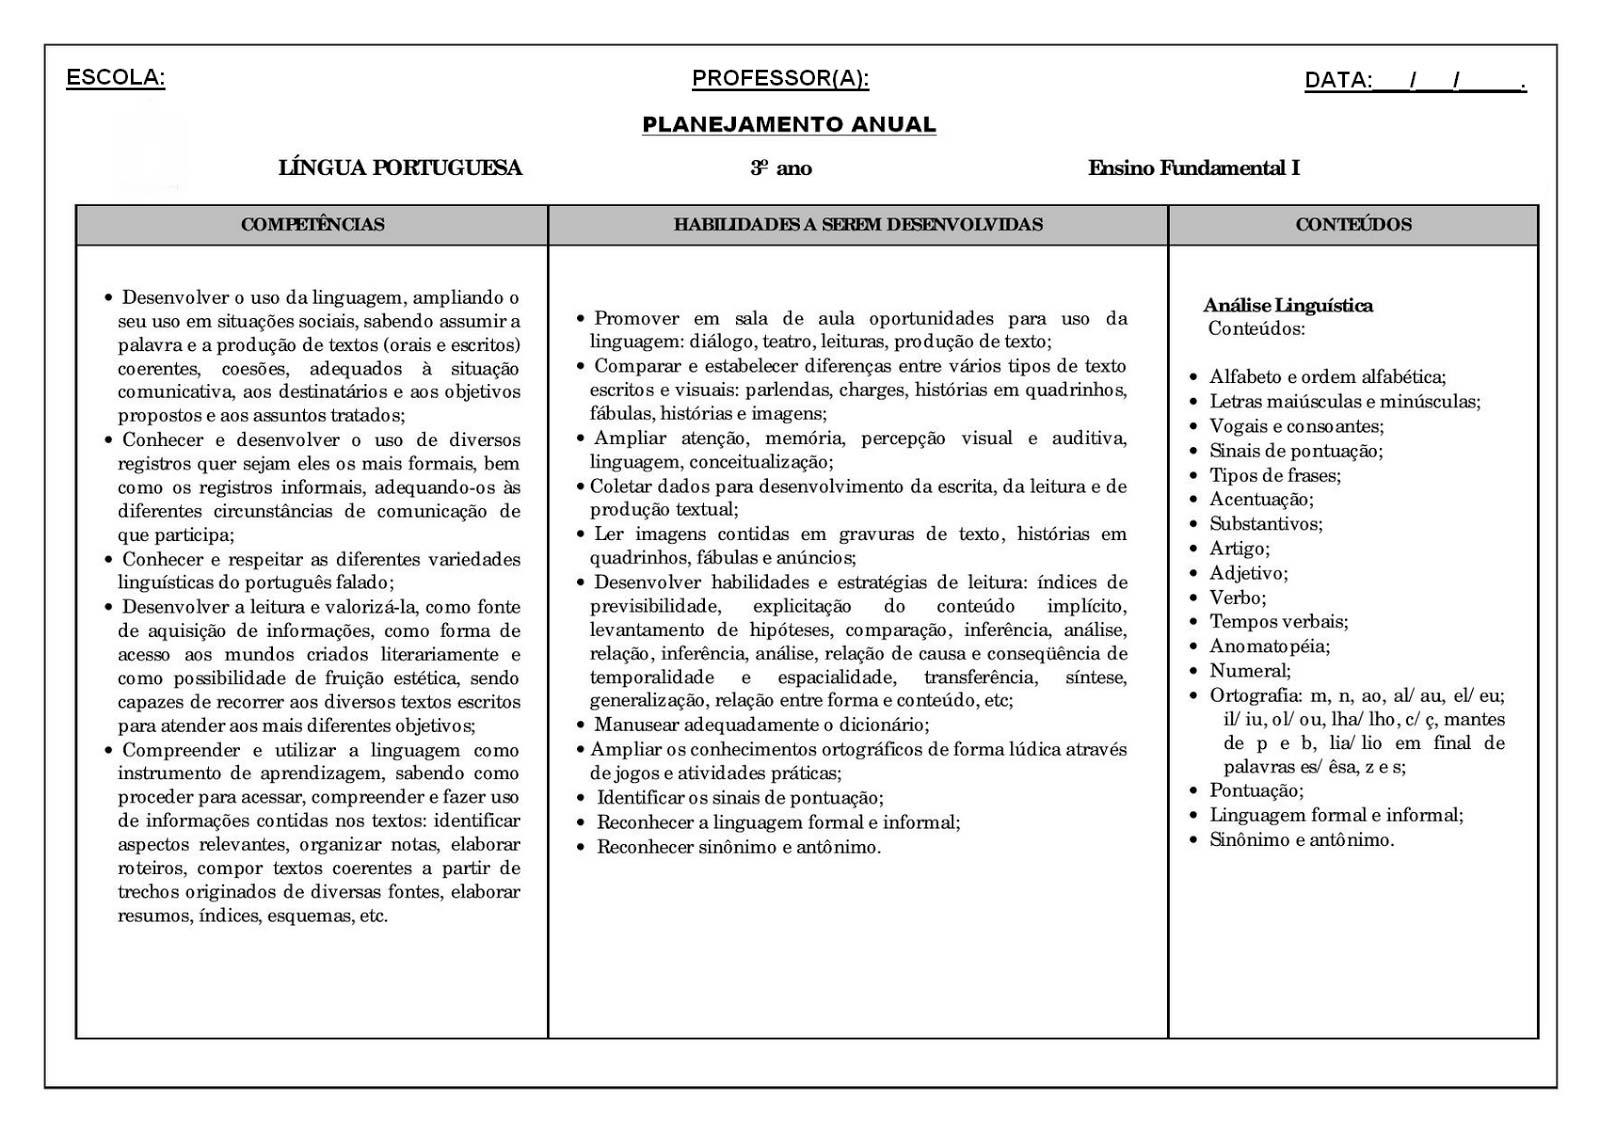 Planejamento anual 3 ano de Língua Portuguesa